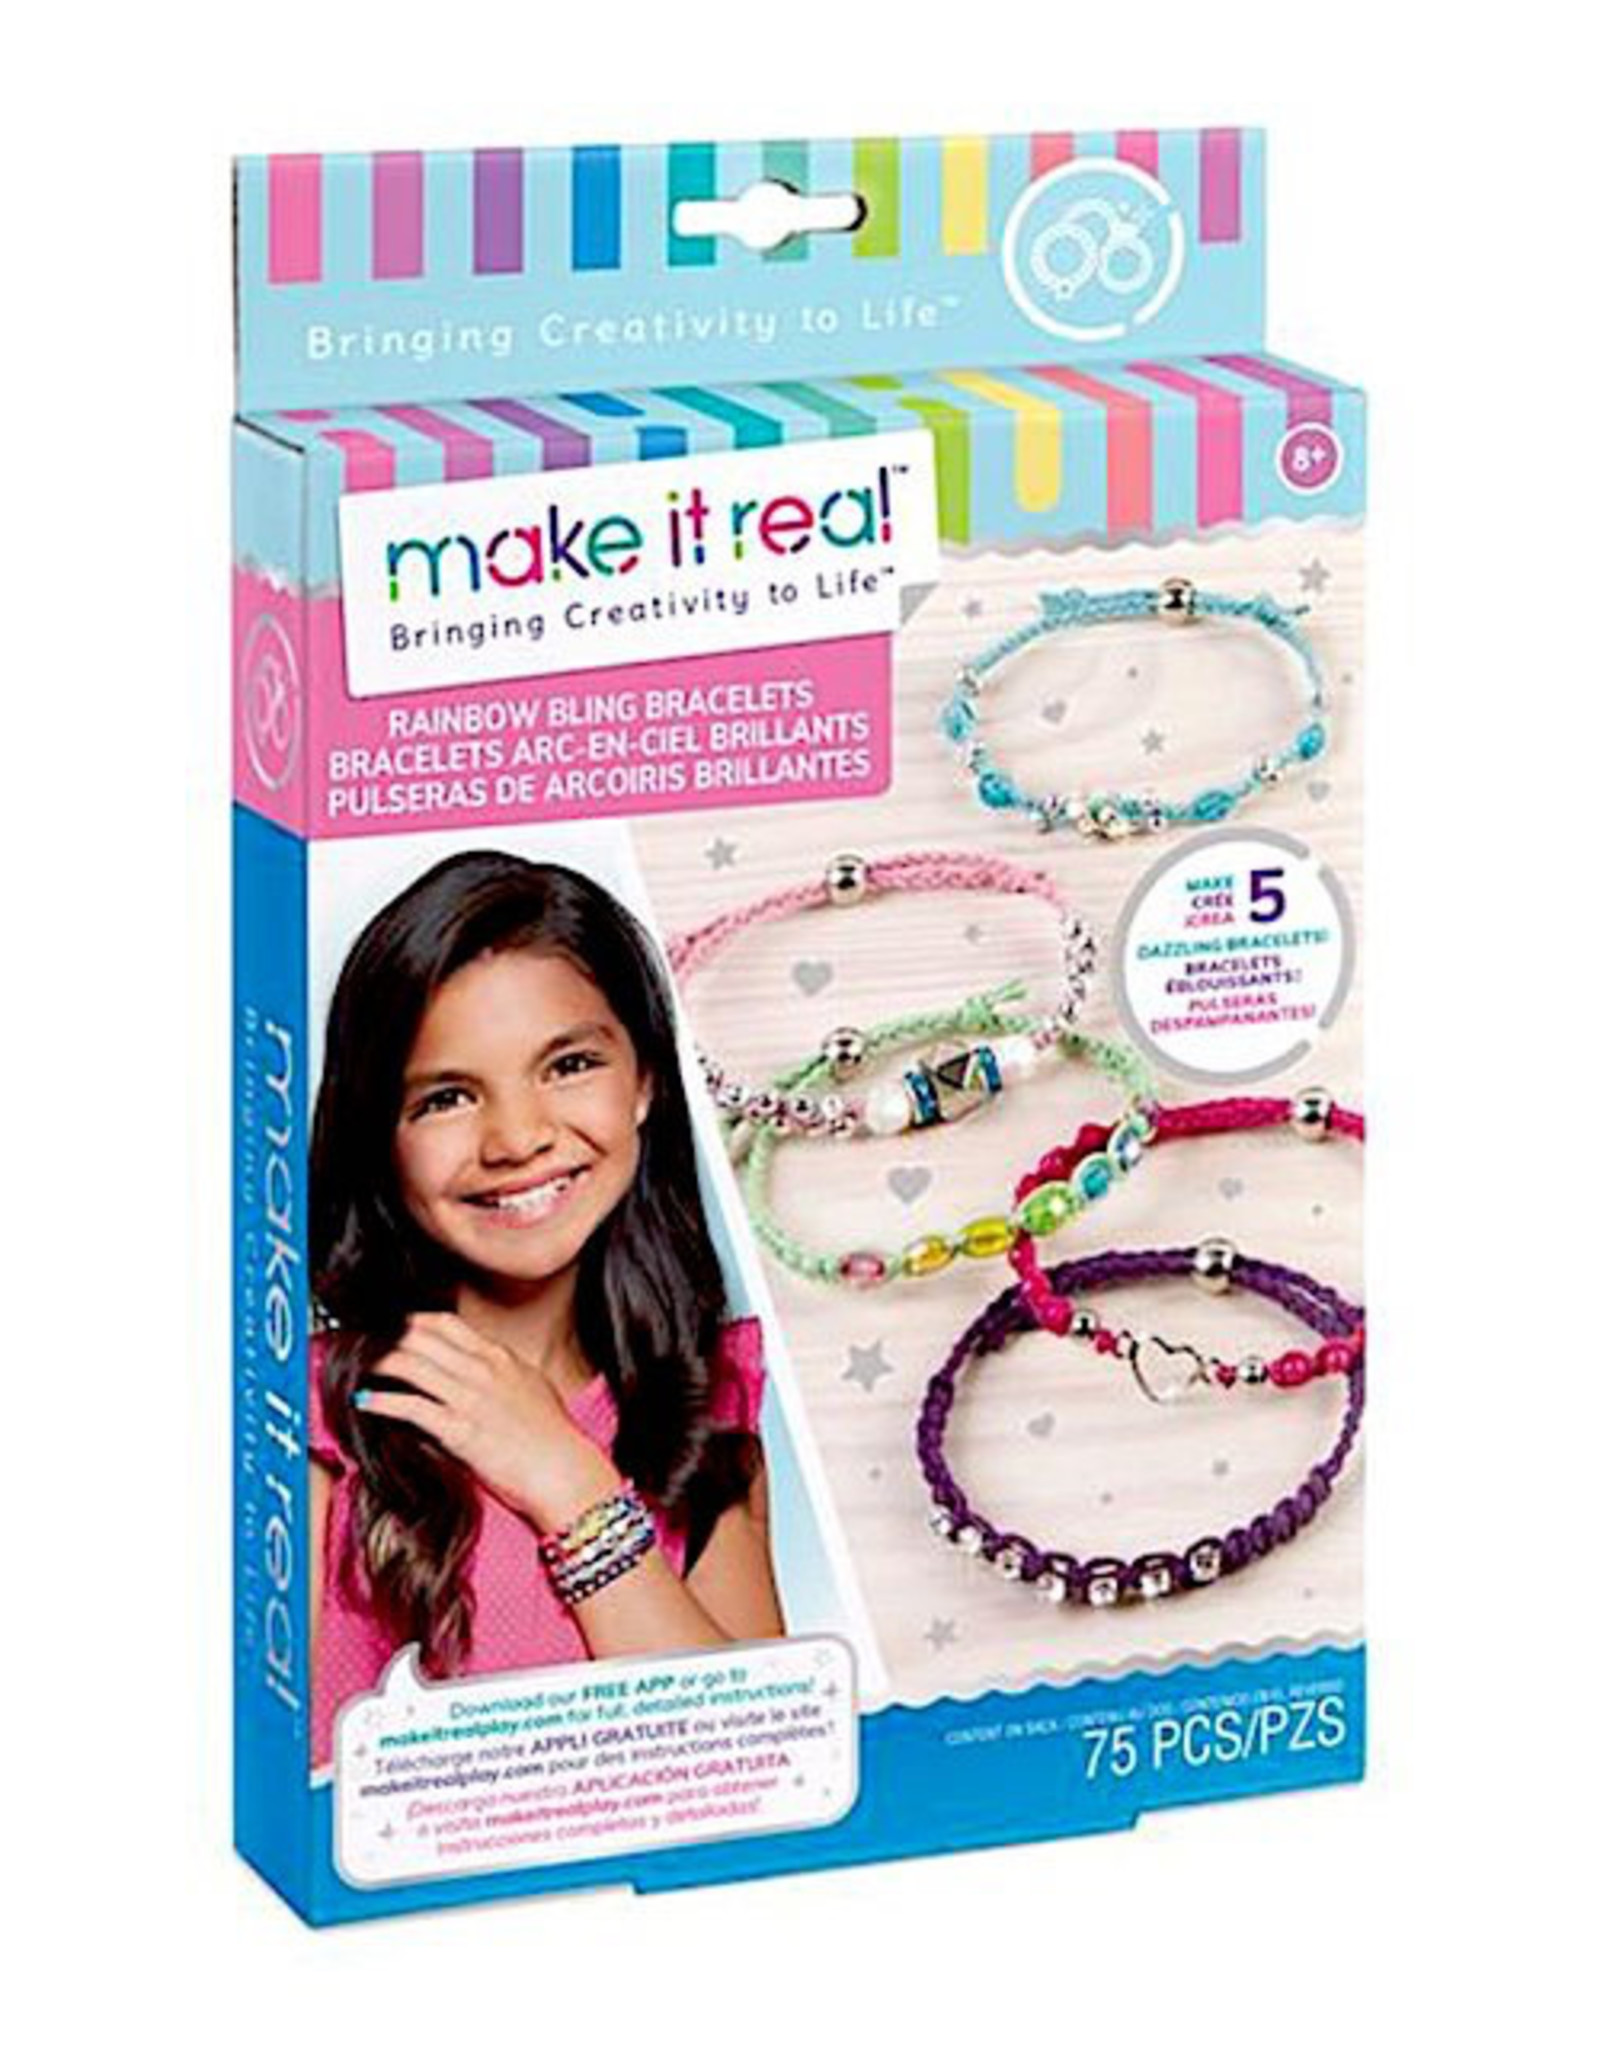 Make It Real Rainbow Bling Bracelets